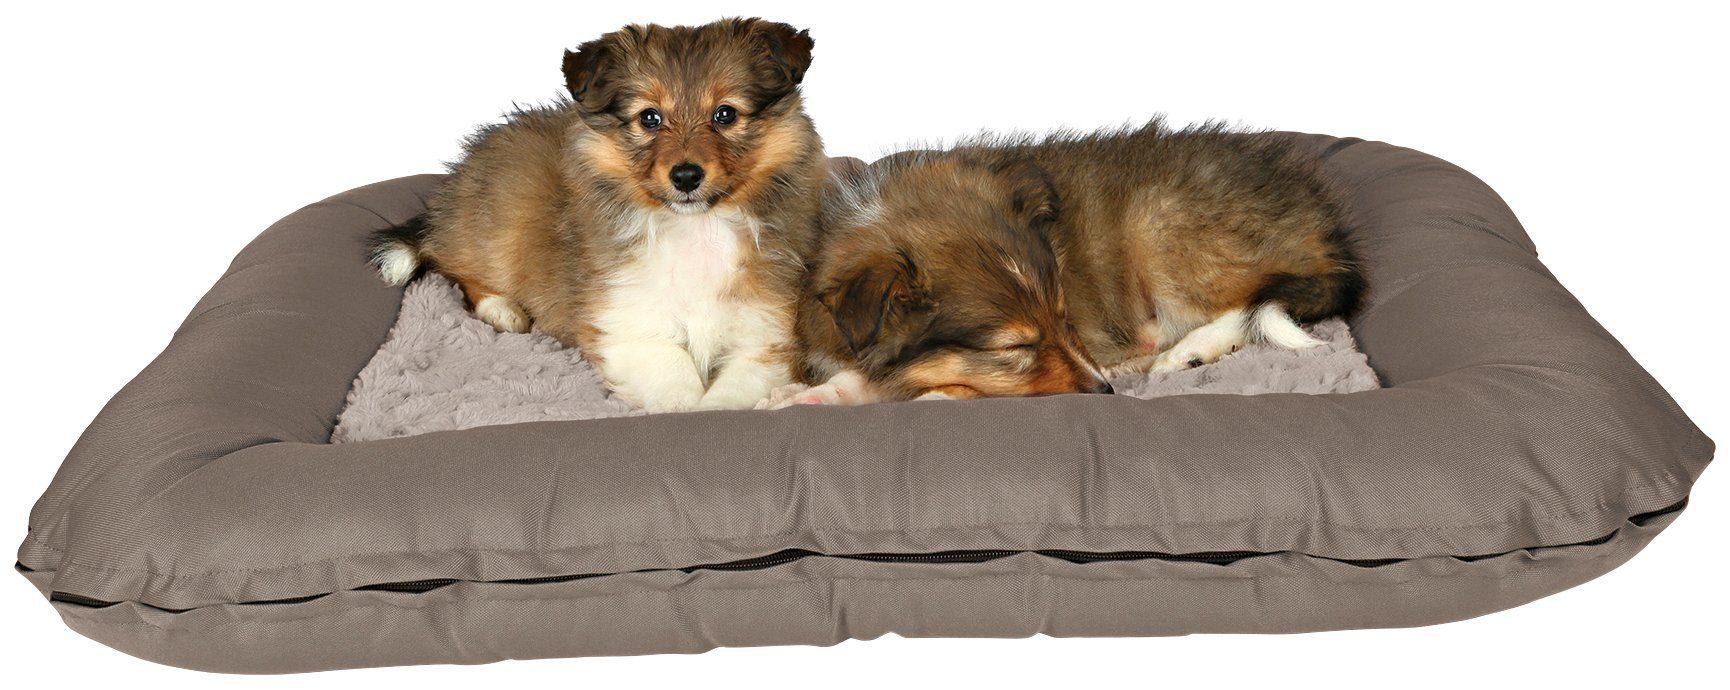 Hundekissen »Drago Cosy«, BxL: 120x80 cm, taupe/beige